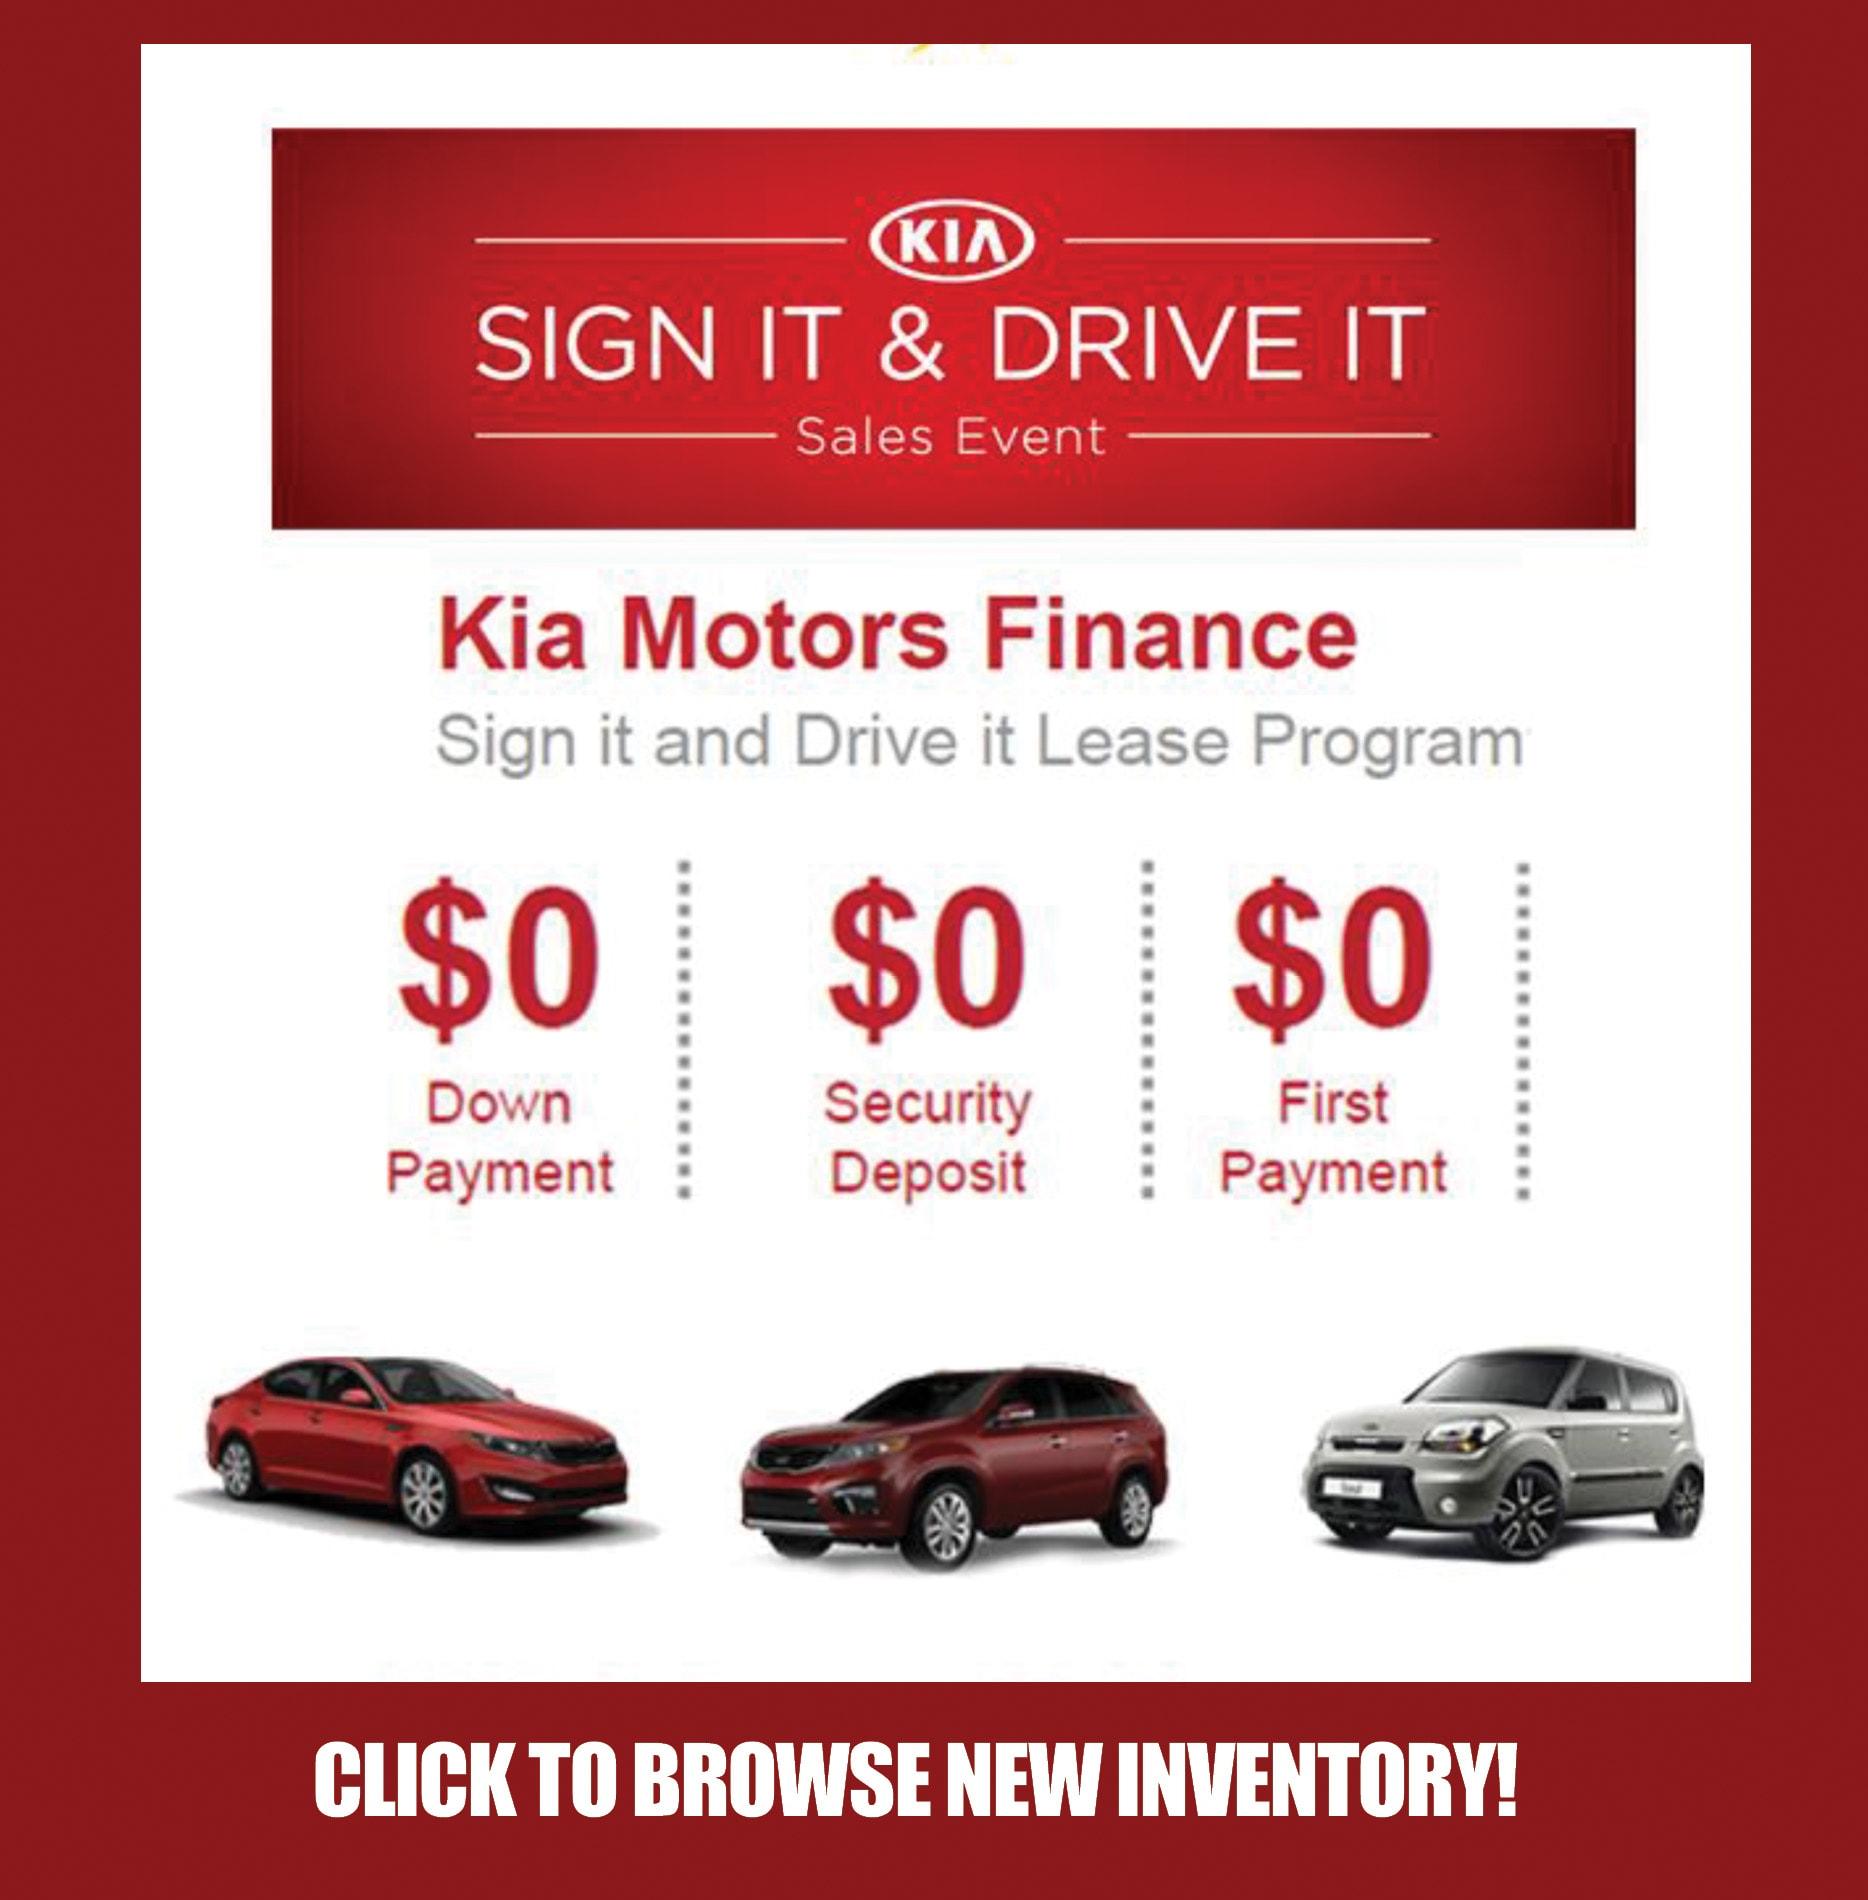 Kia motor finance address for payments for Hyundai motor finance customer service phone